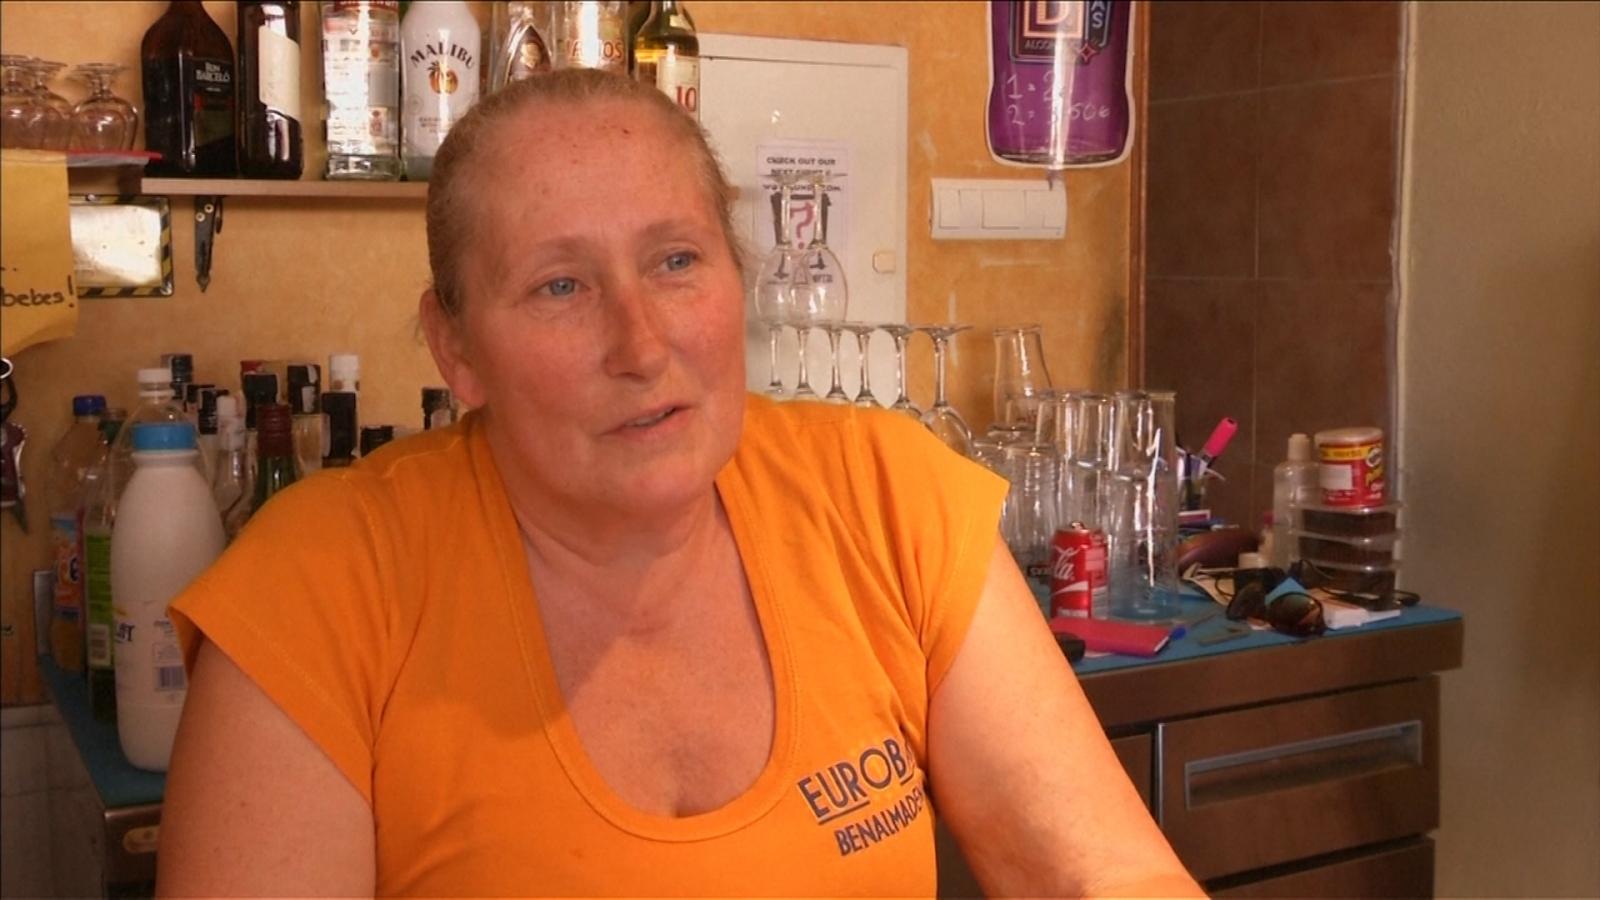 Joanne Rimmer, Owner of the Euro Bar